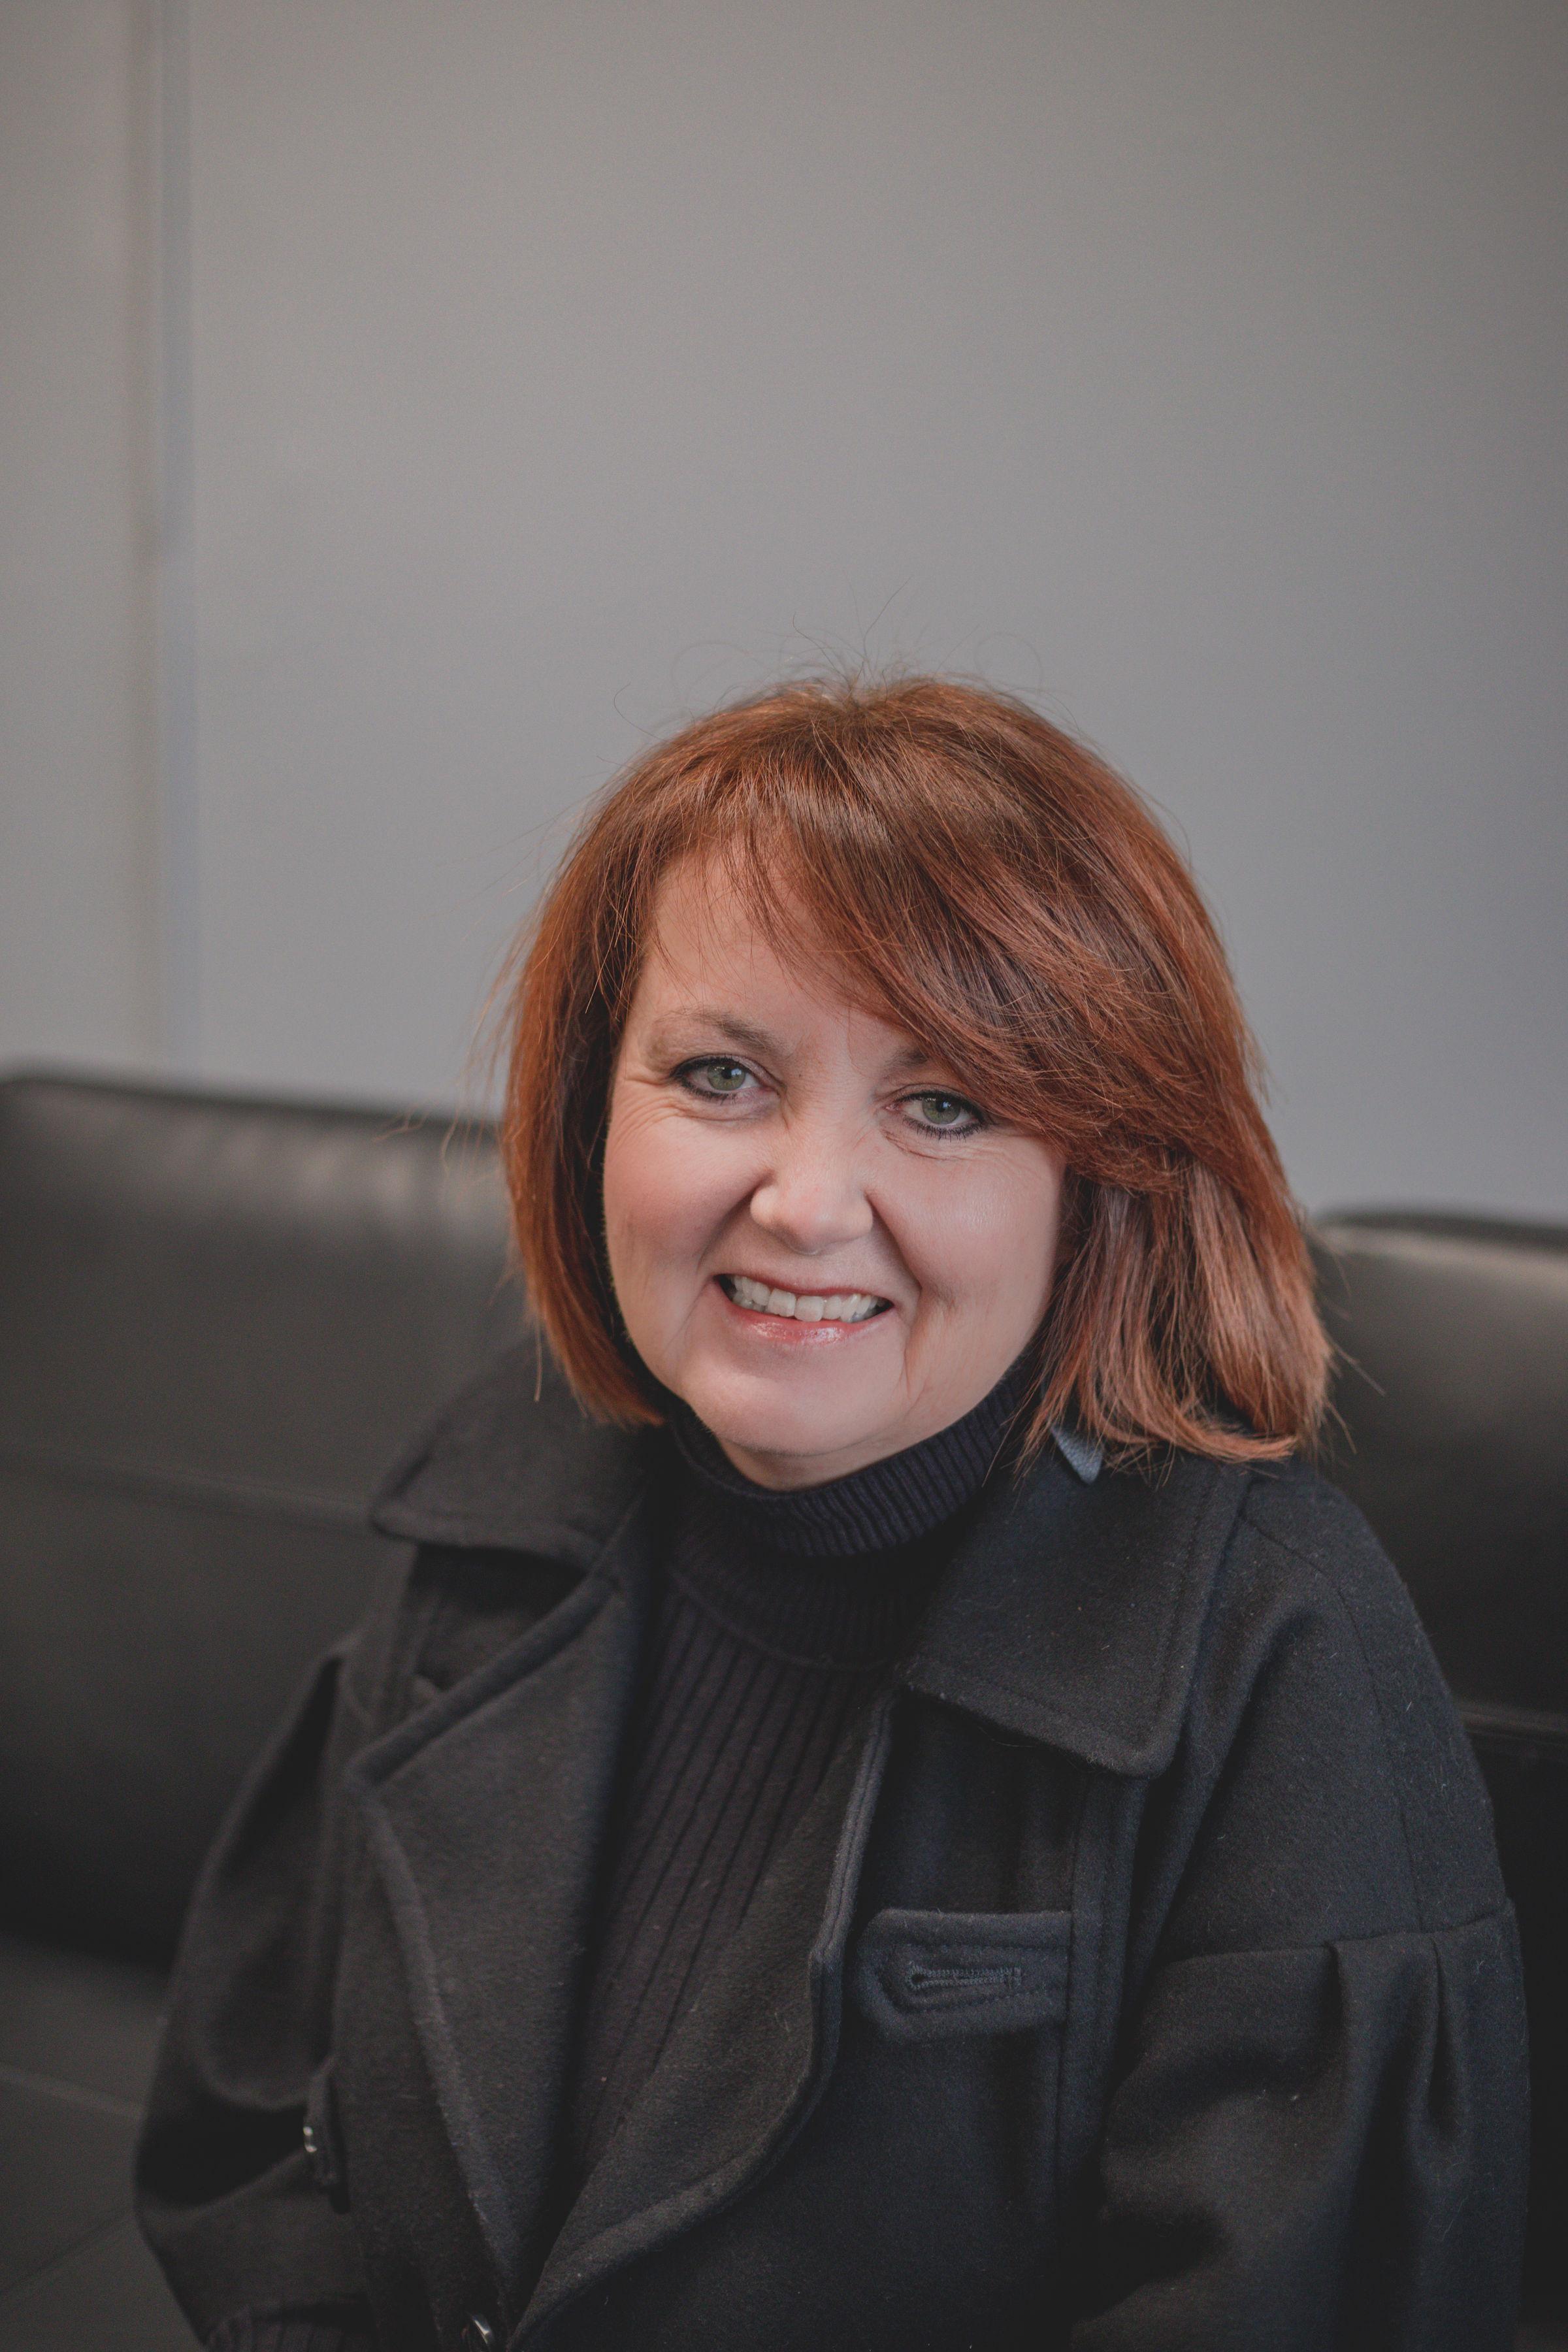 Pam Sacco